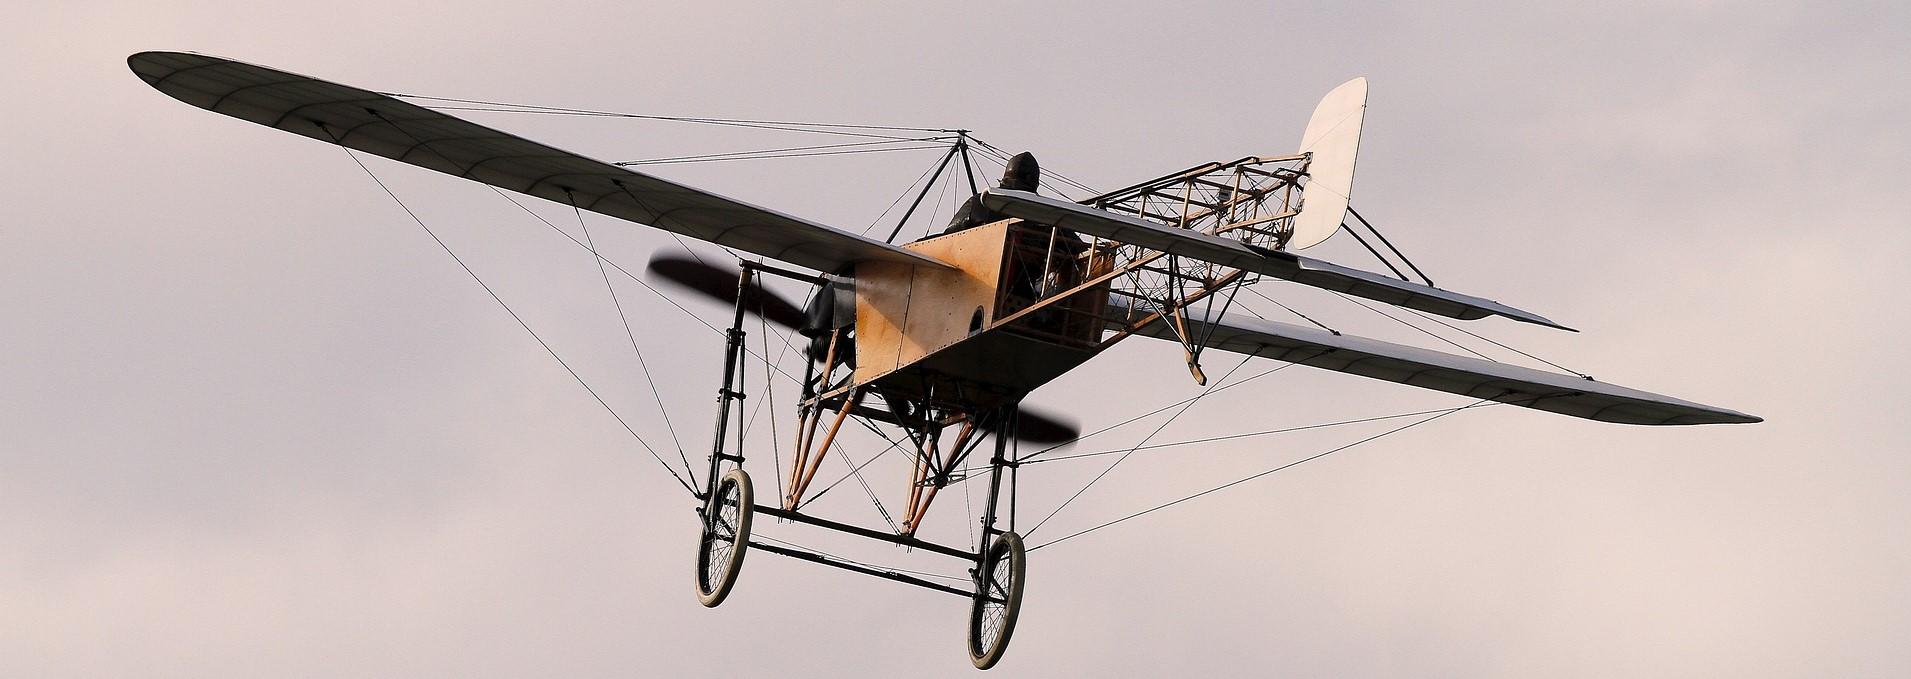 #141 Wright Brothers dream.jpg